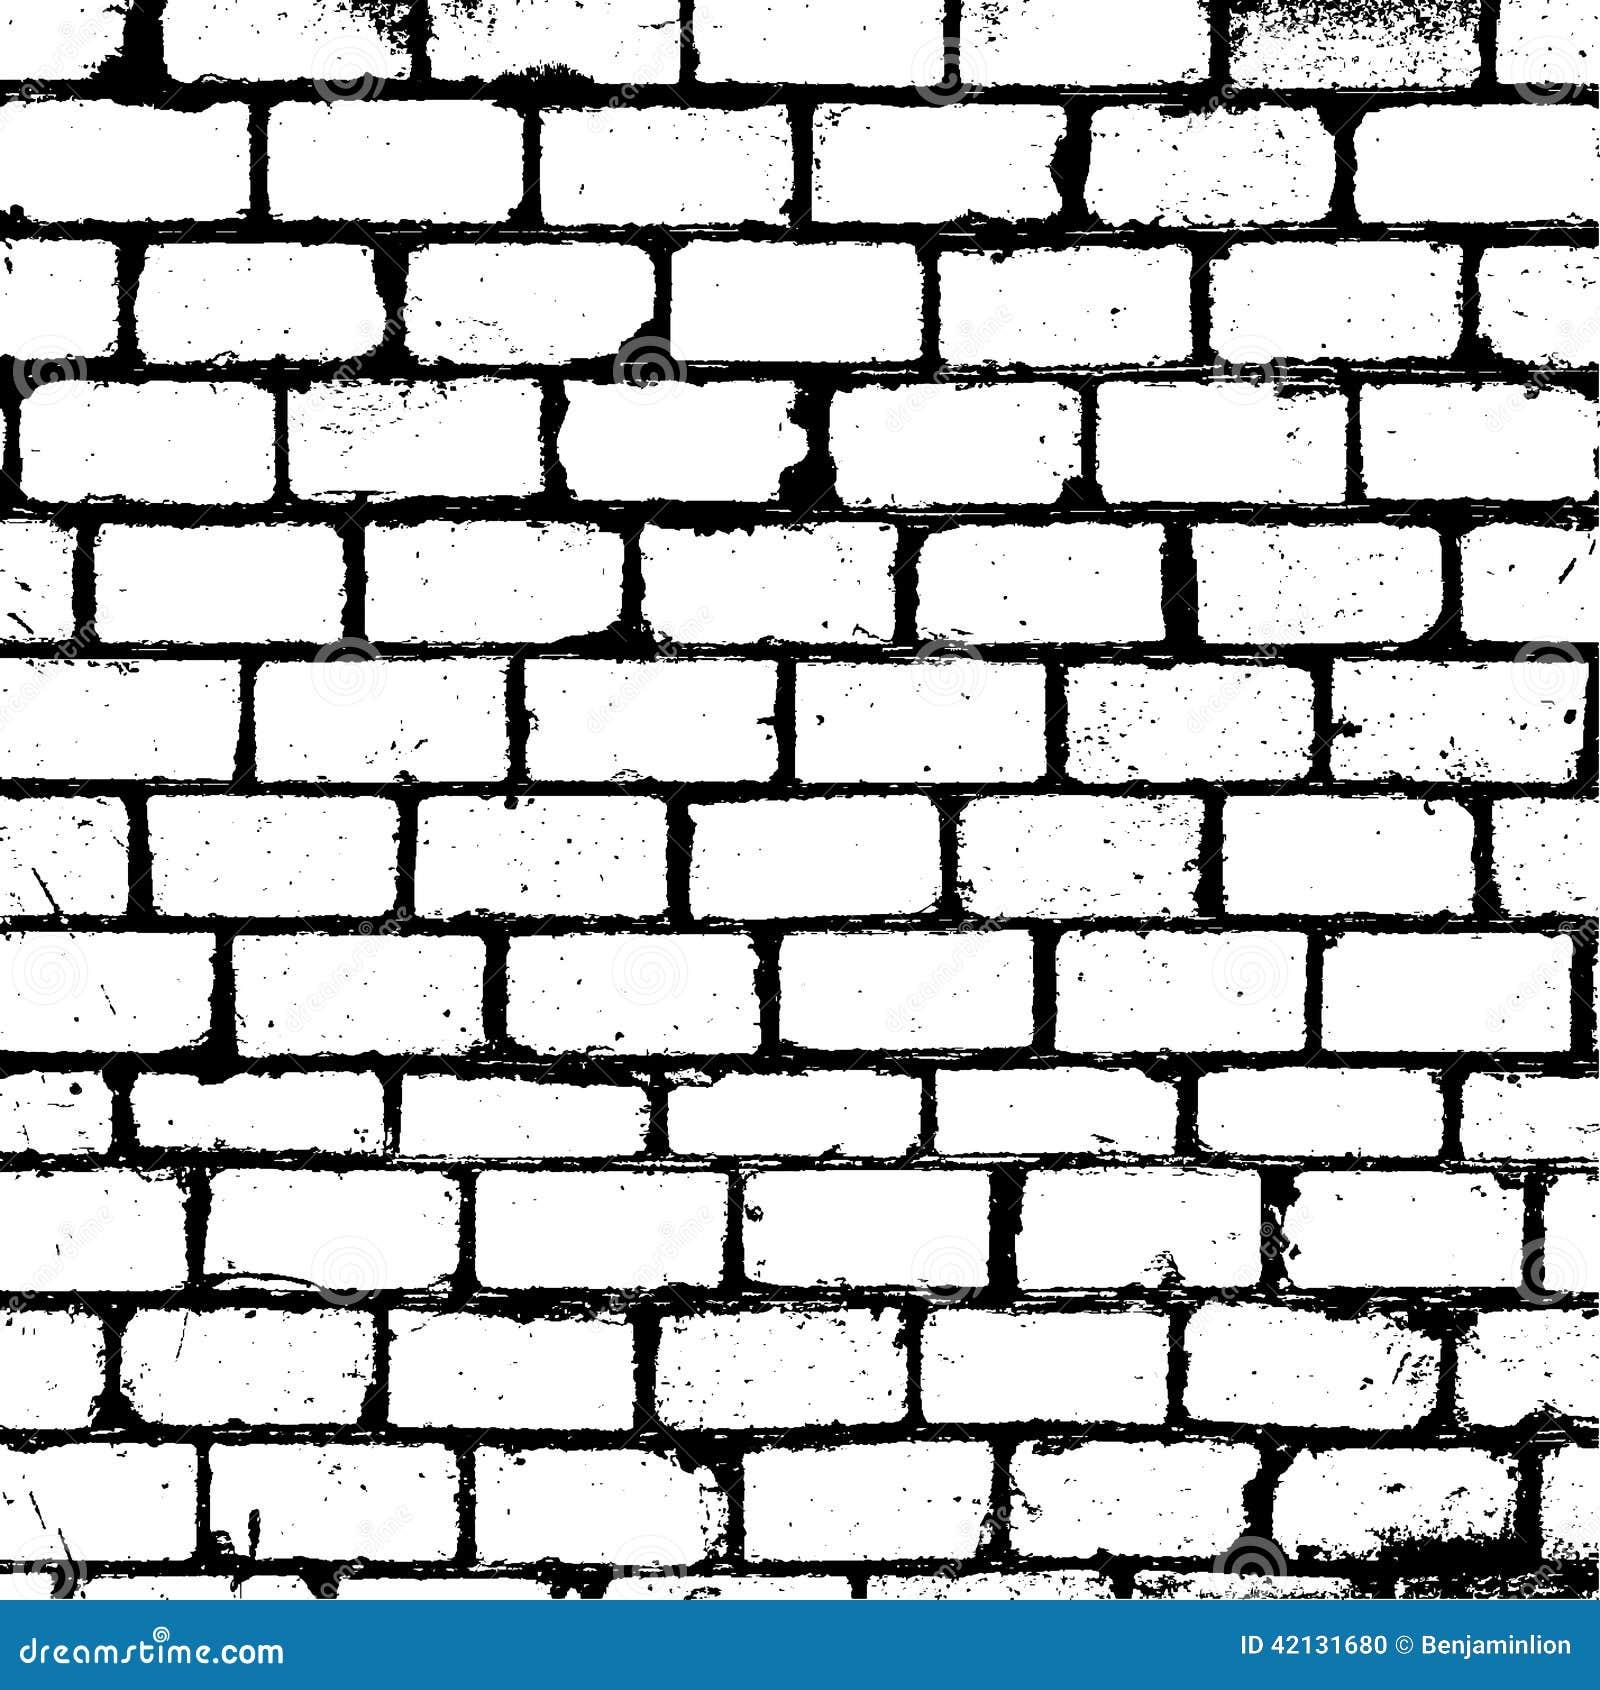 Brickwall Overlay Texture Stock Vector - Image: 42131680